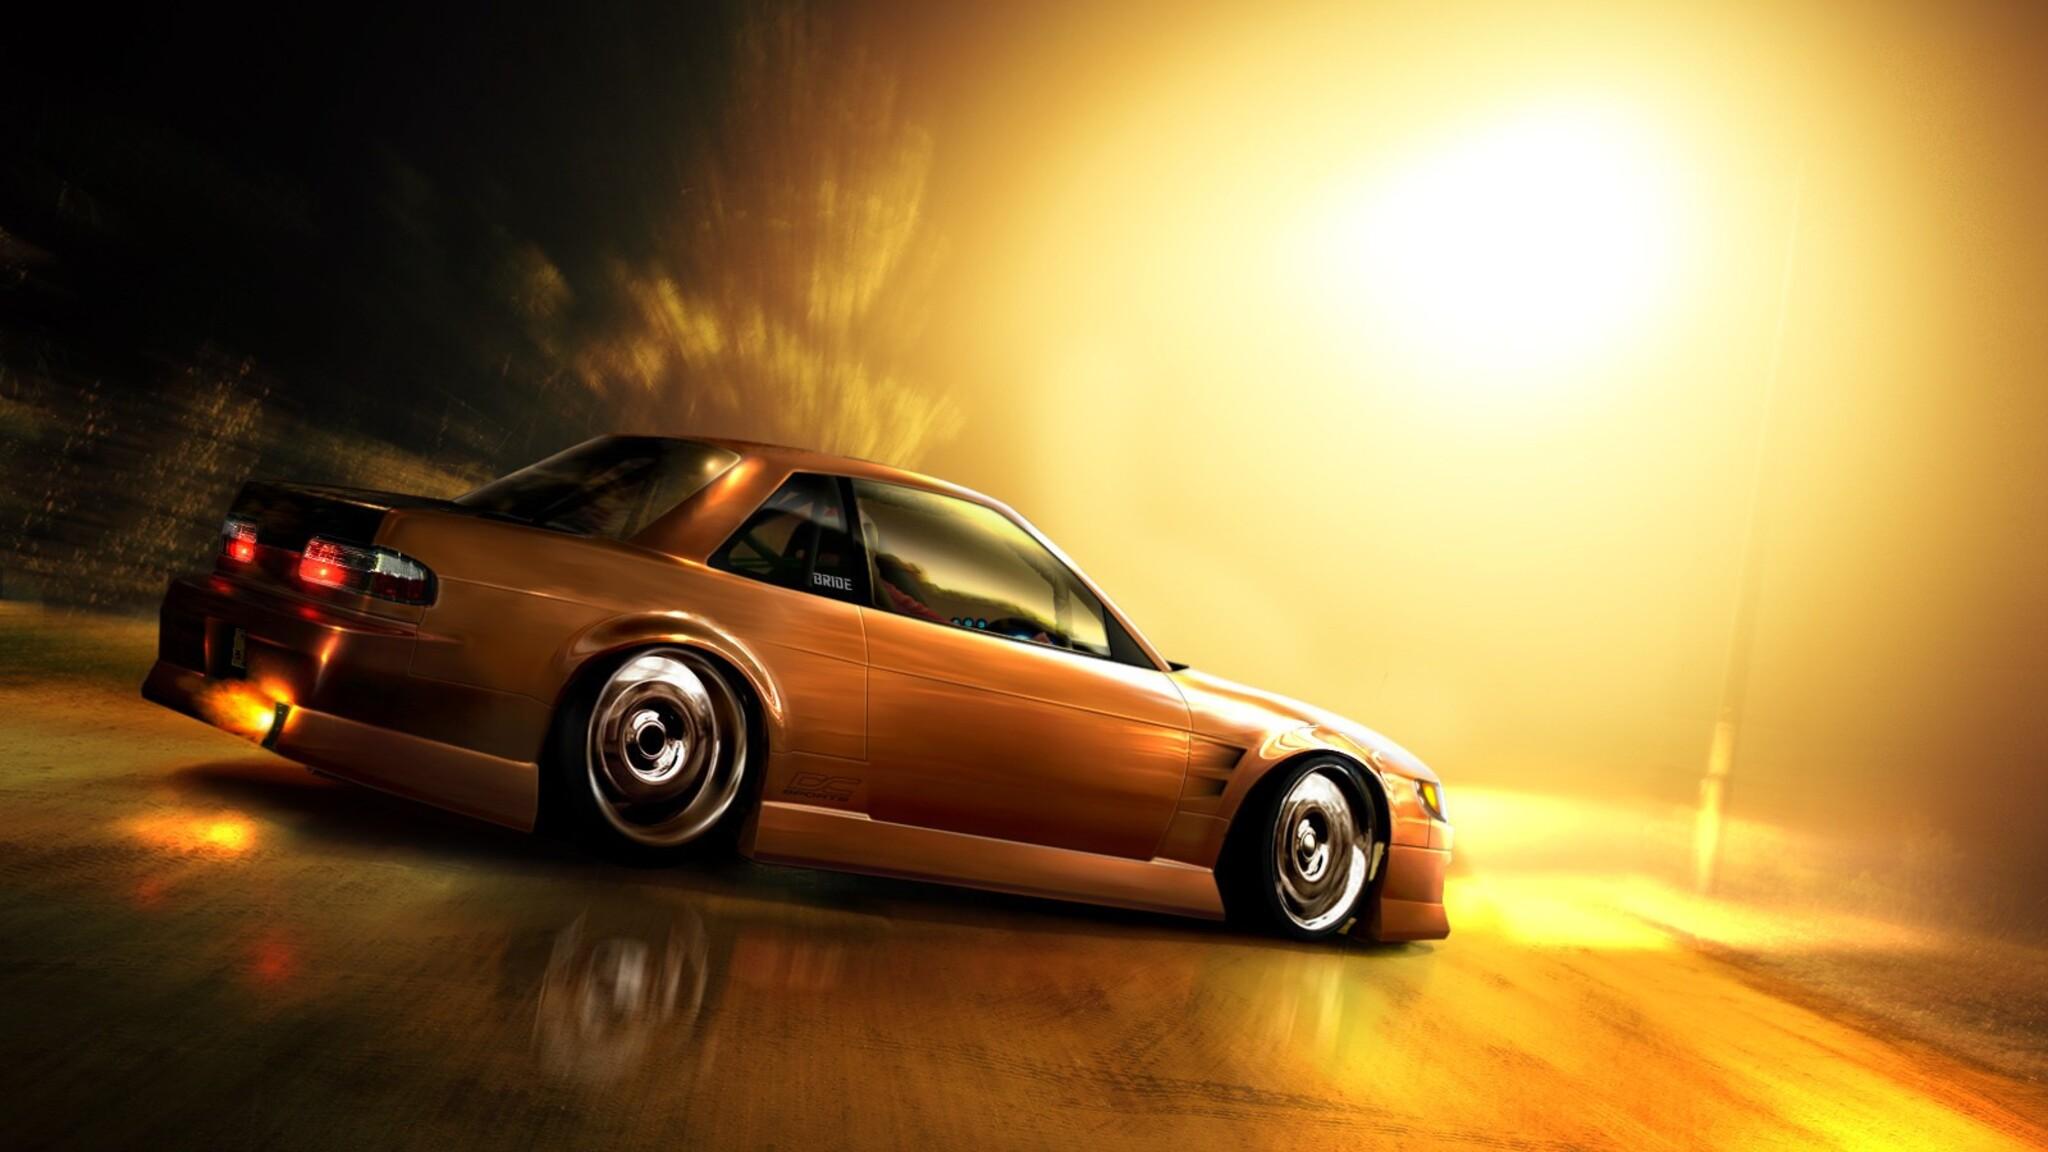 2048x1152 Drifitng Car Artwork 2048x1152 Resolution HD 4k ...